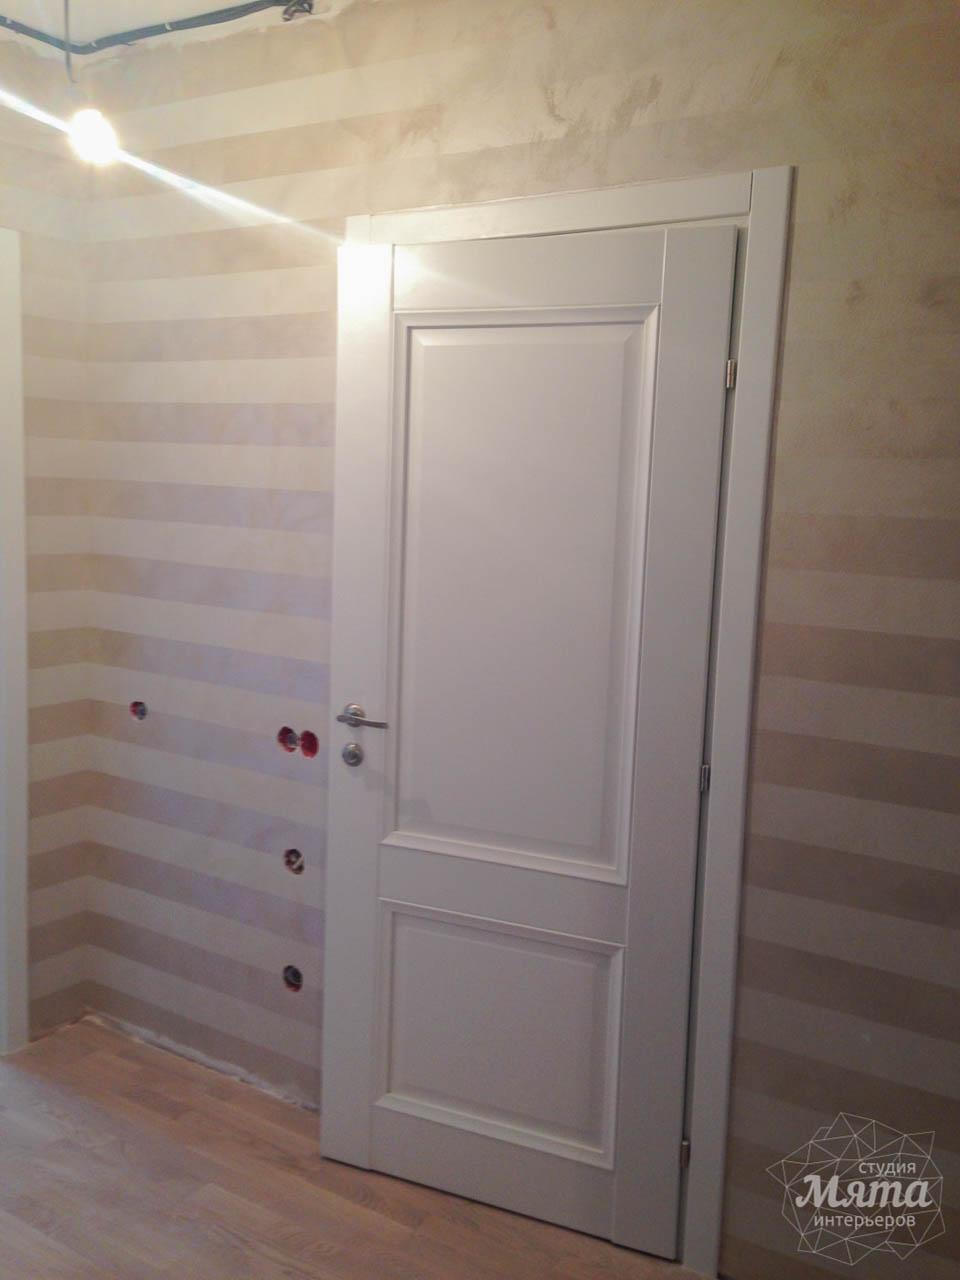 Дизайн интерьера и ремонт трехкомнатной квартиры по ул. Фучика 9 54